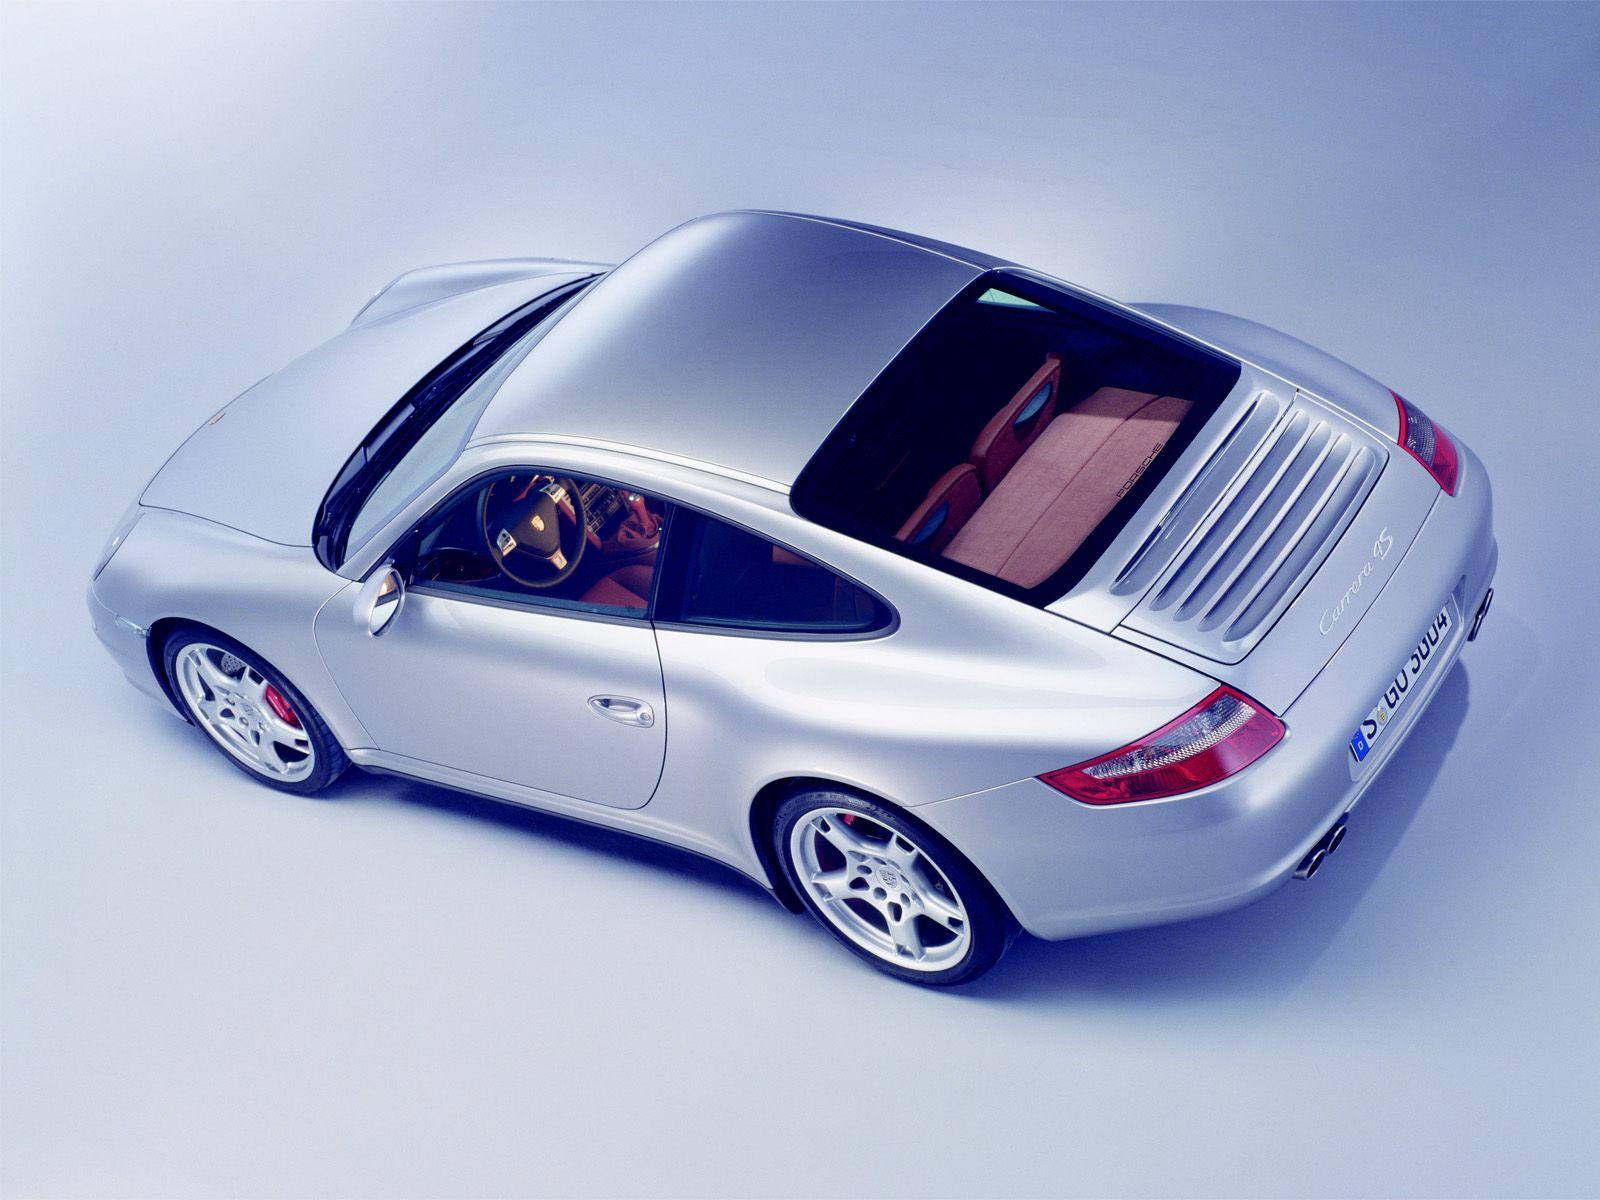 Porsche Carrera S photos PhotoGallery with pics 1920×1080 ...